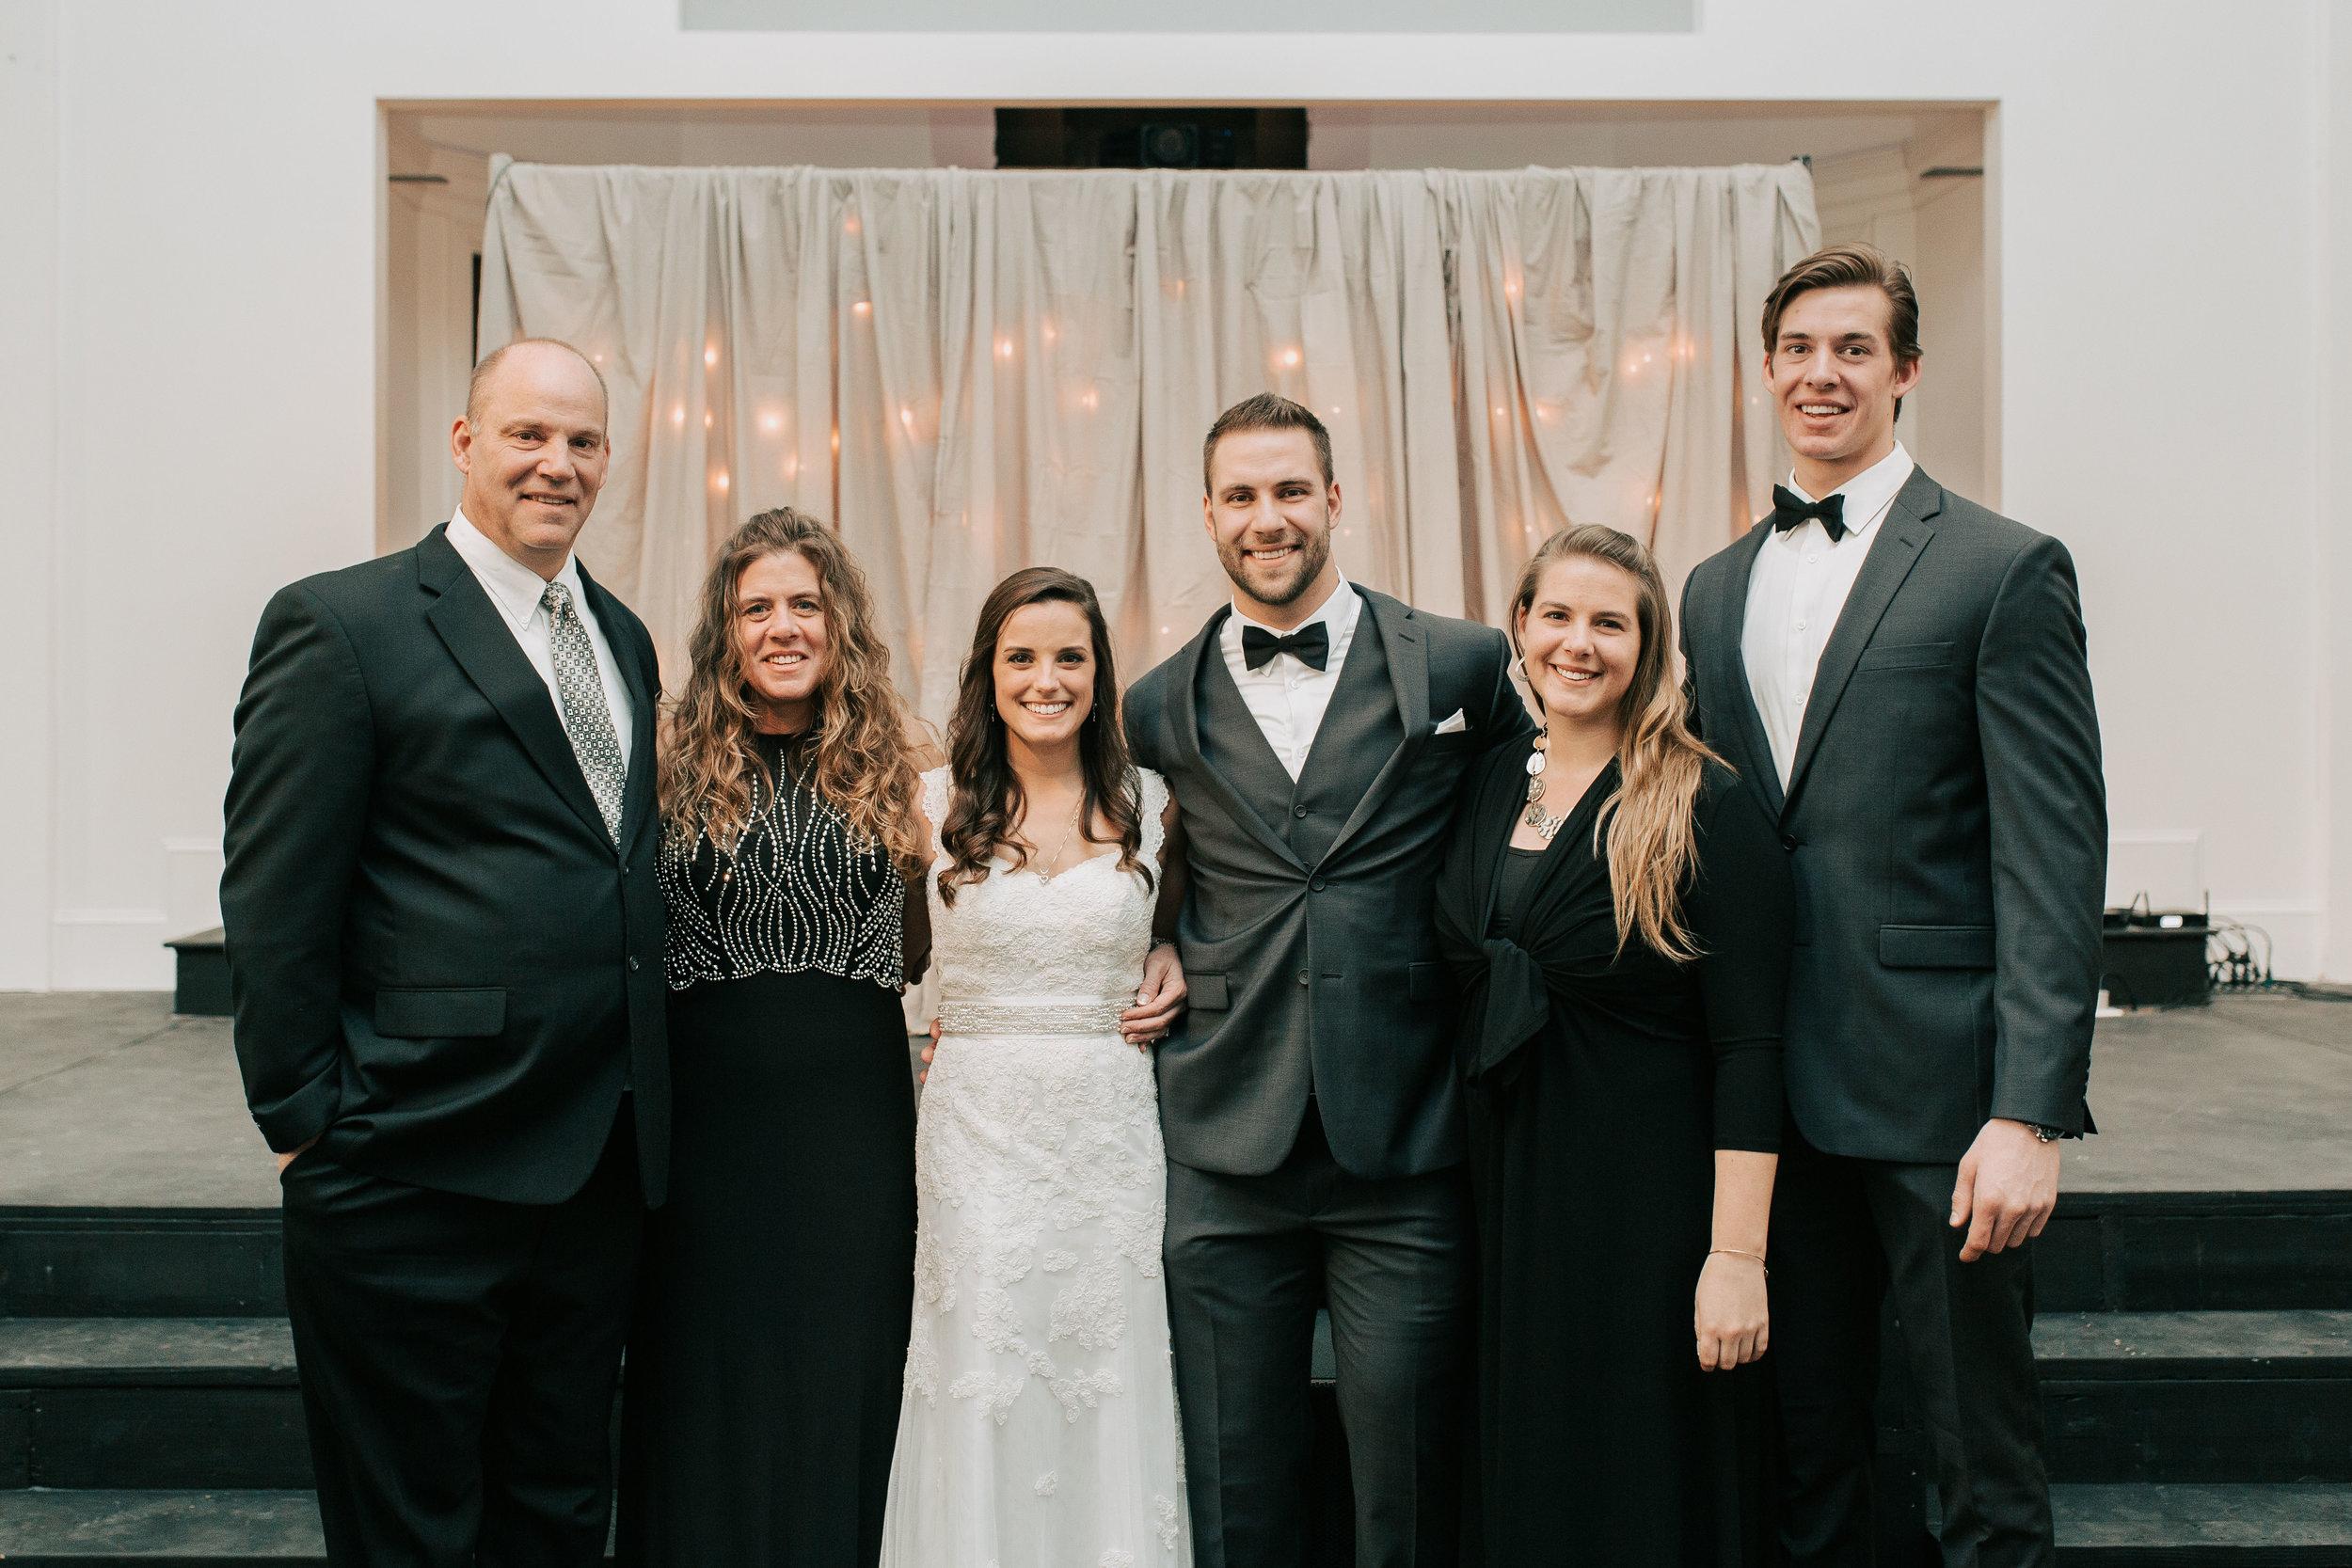 nicole-daacke-photography-boston-massachusetts-seaside-intimate-winter-wedding-photographer-20.jpg